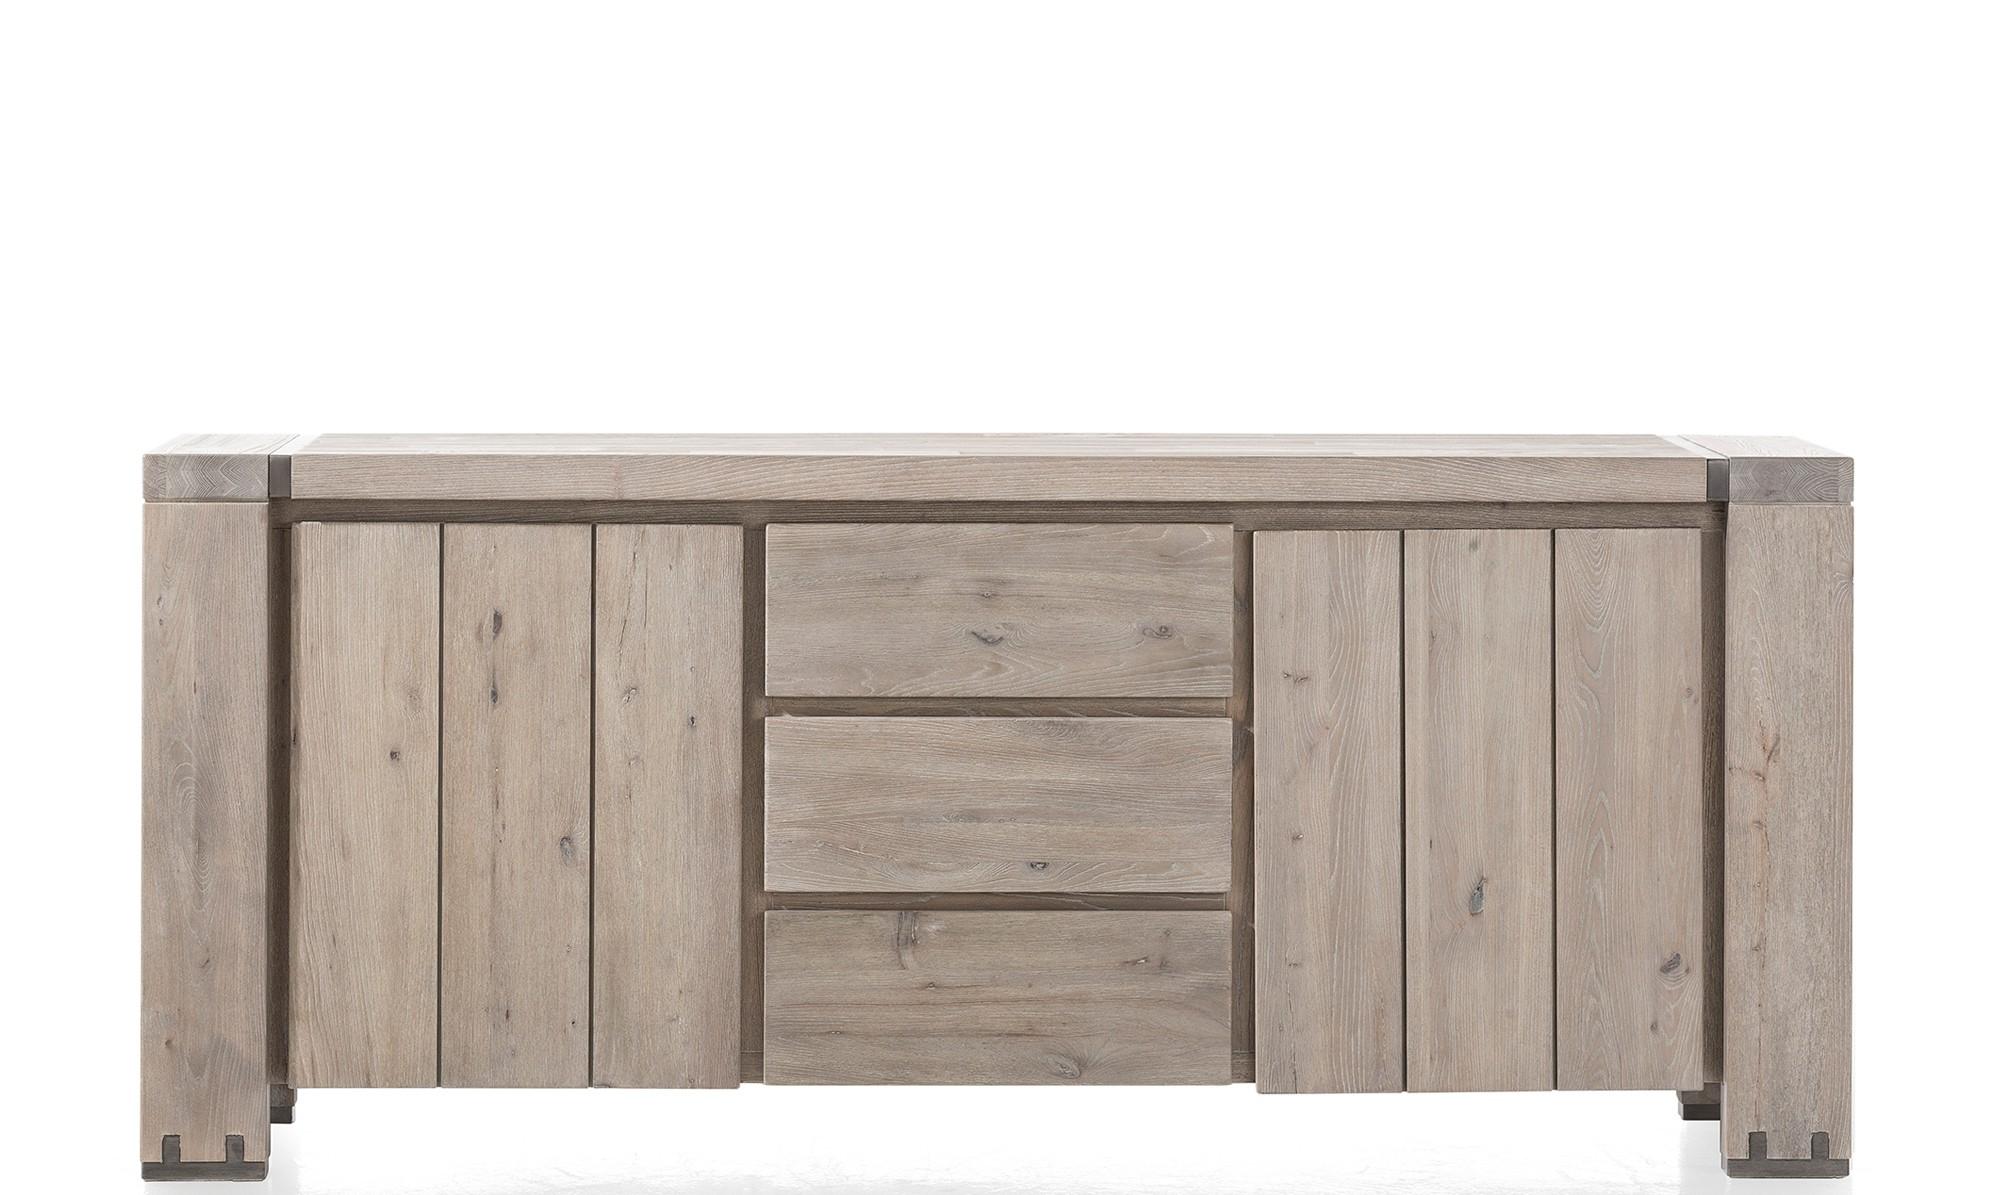 Favorite Square Brass 4 Door Sideboards For Sideboards – Modern, Oak & Pine Sideboards – Fishpools (View 4 of 20)